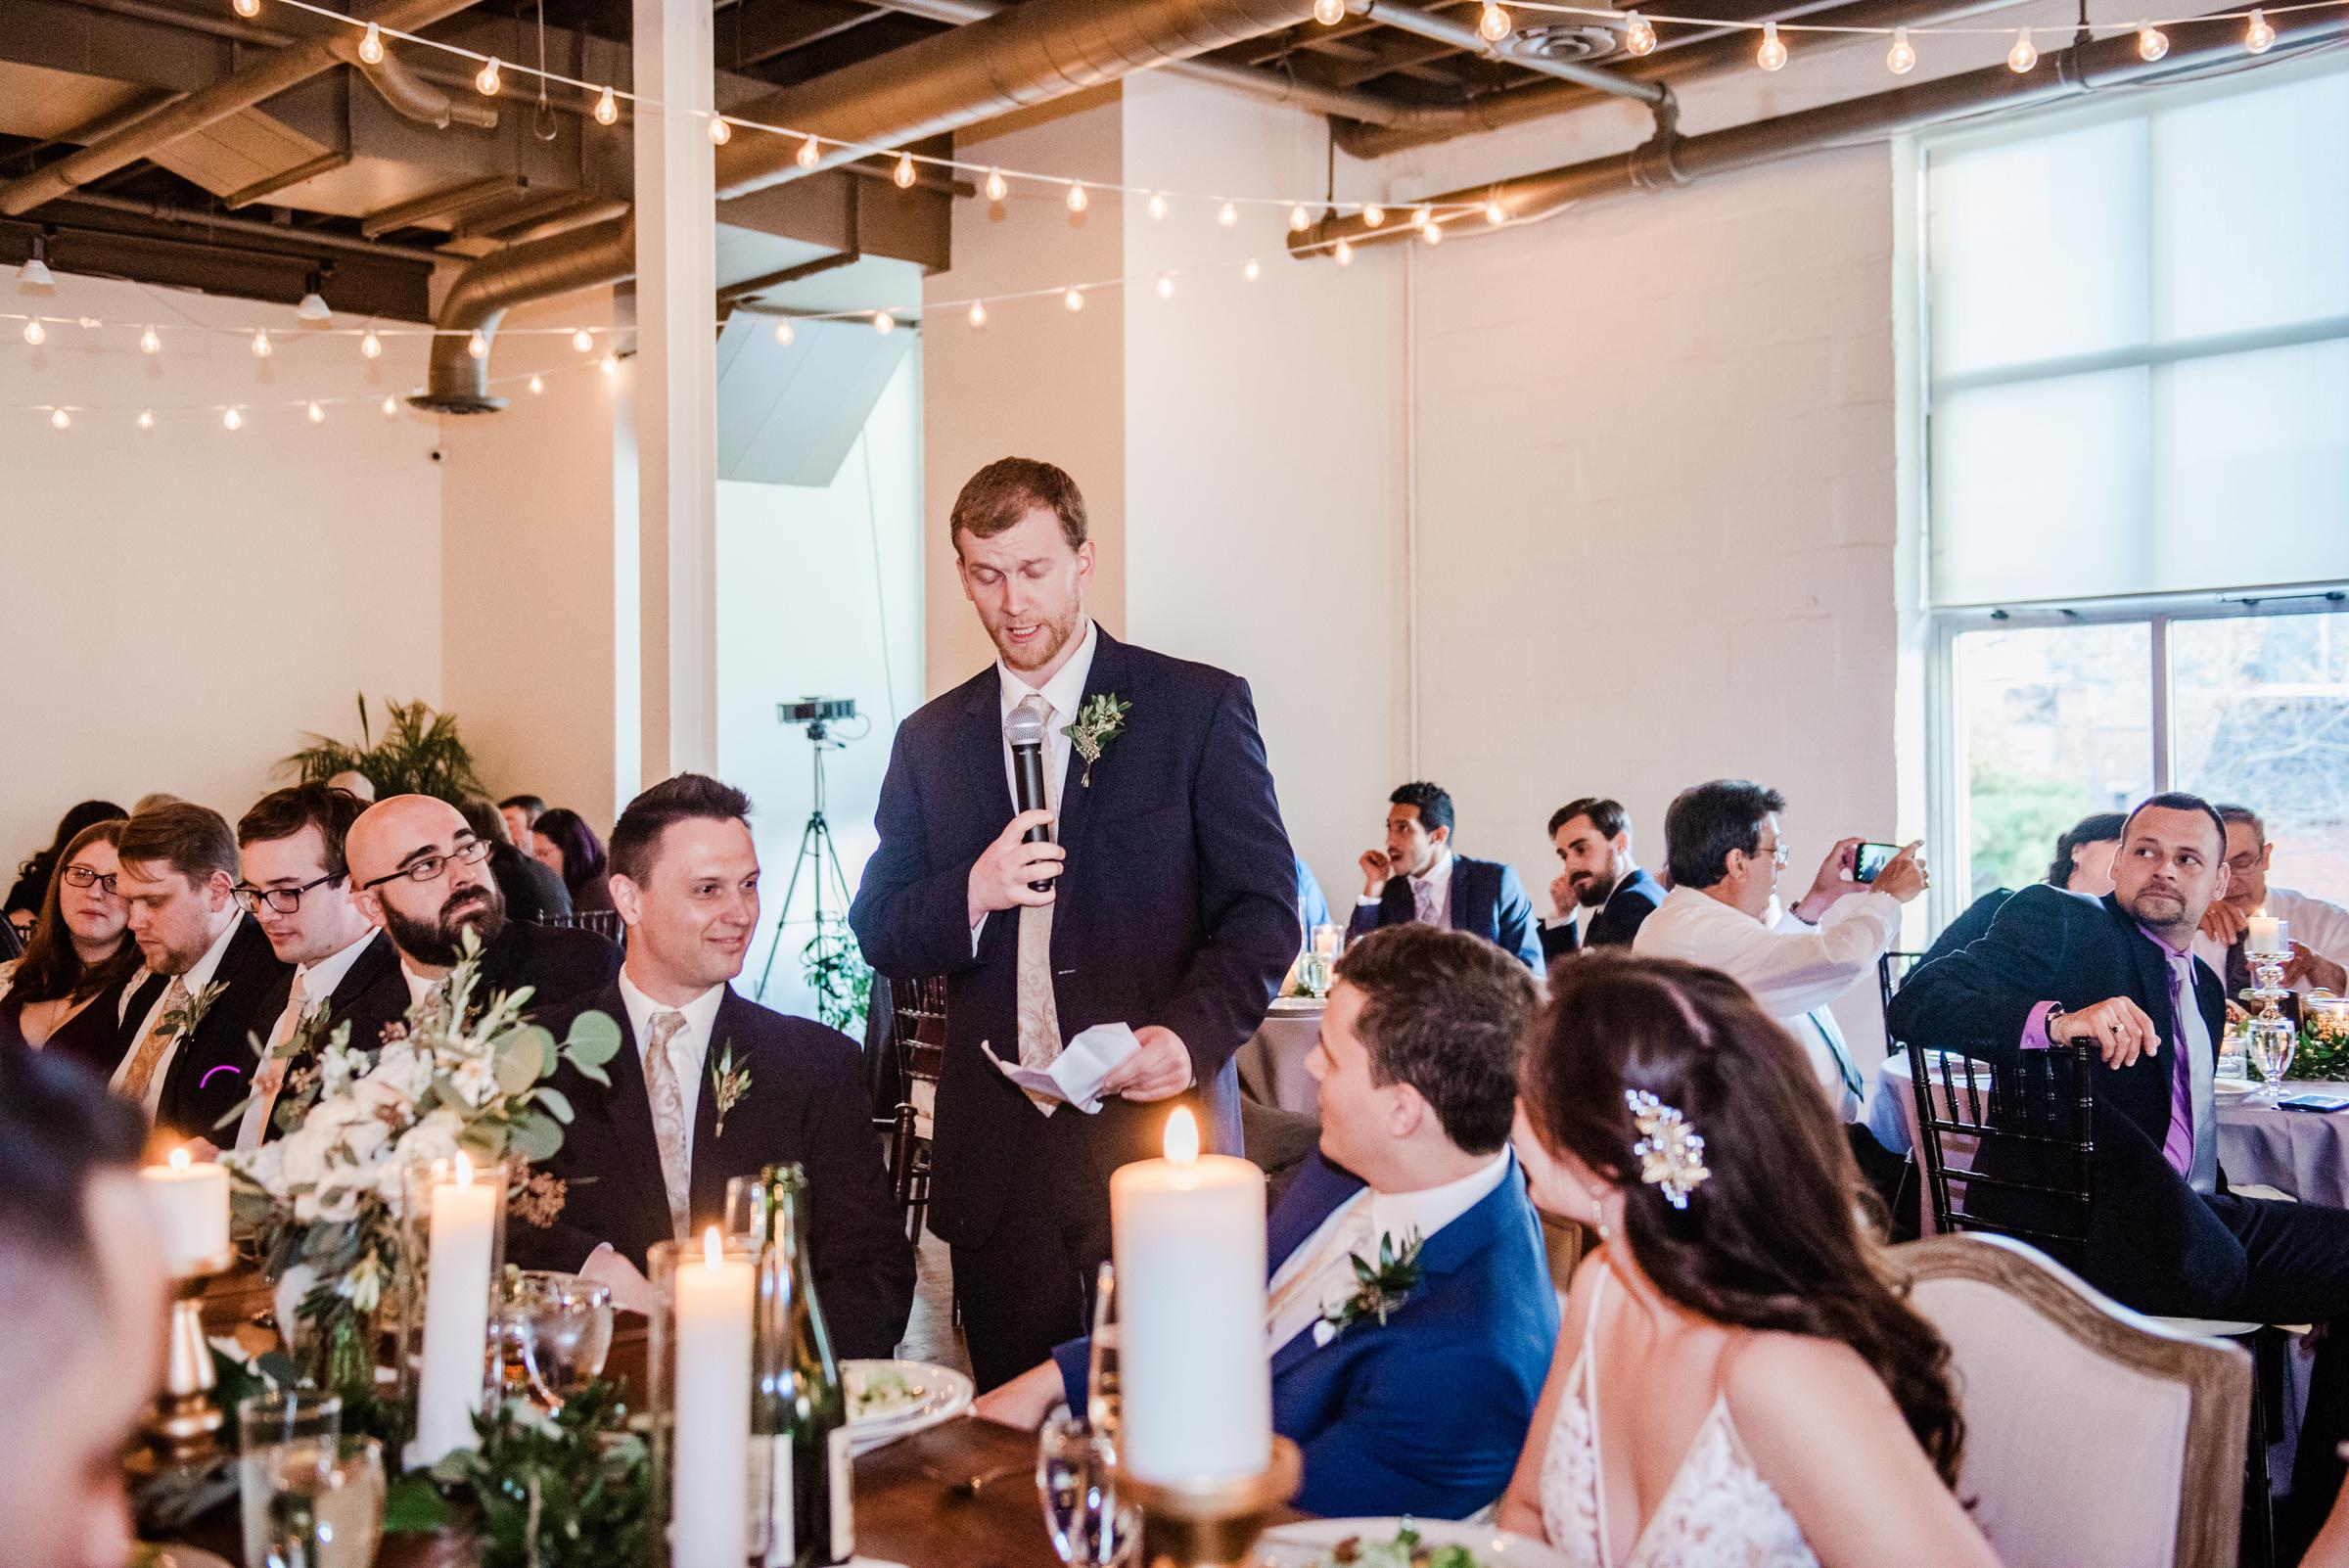 The_Arbor_LoftRochester_Wedding_JILL_STUDIO_Rochester_NY_Photographer_190007.jpg